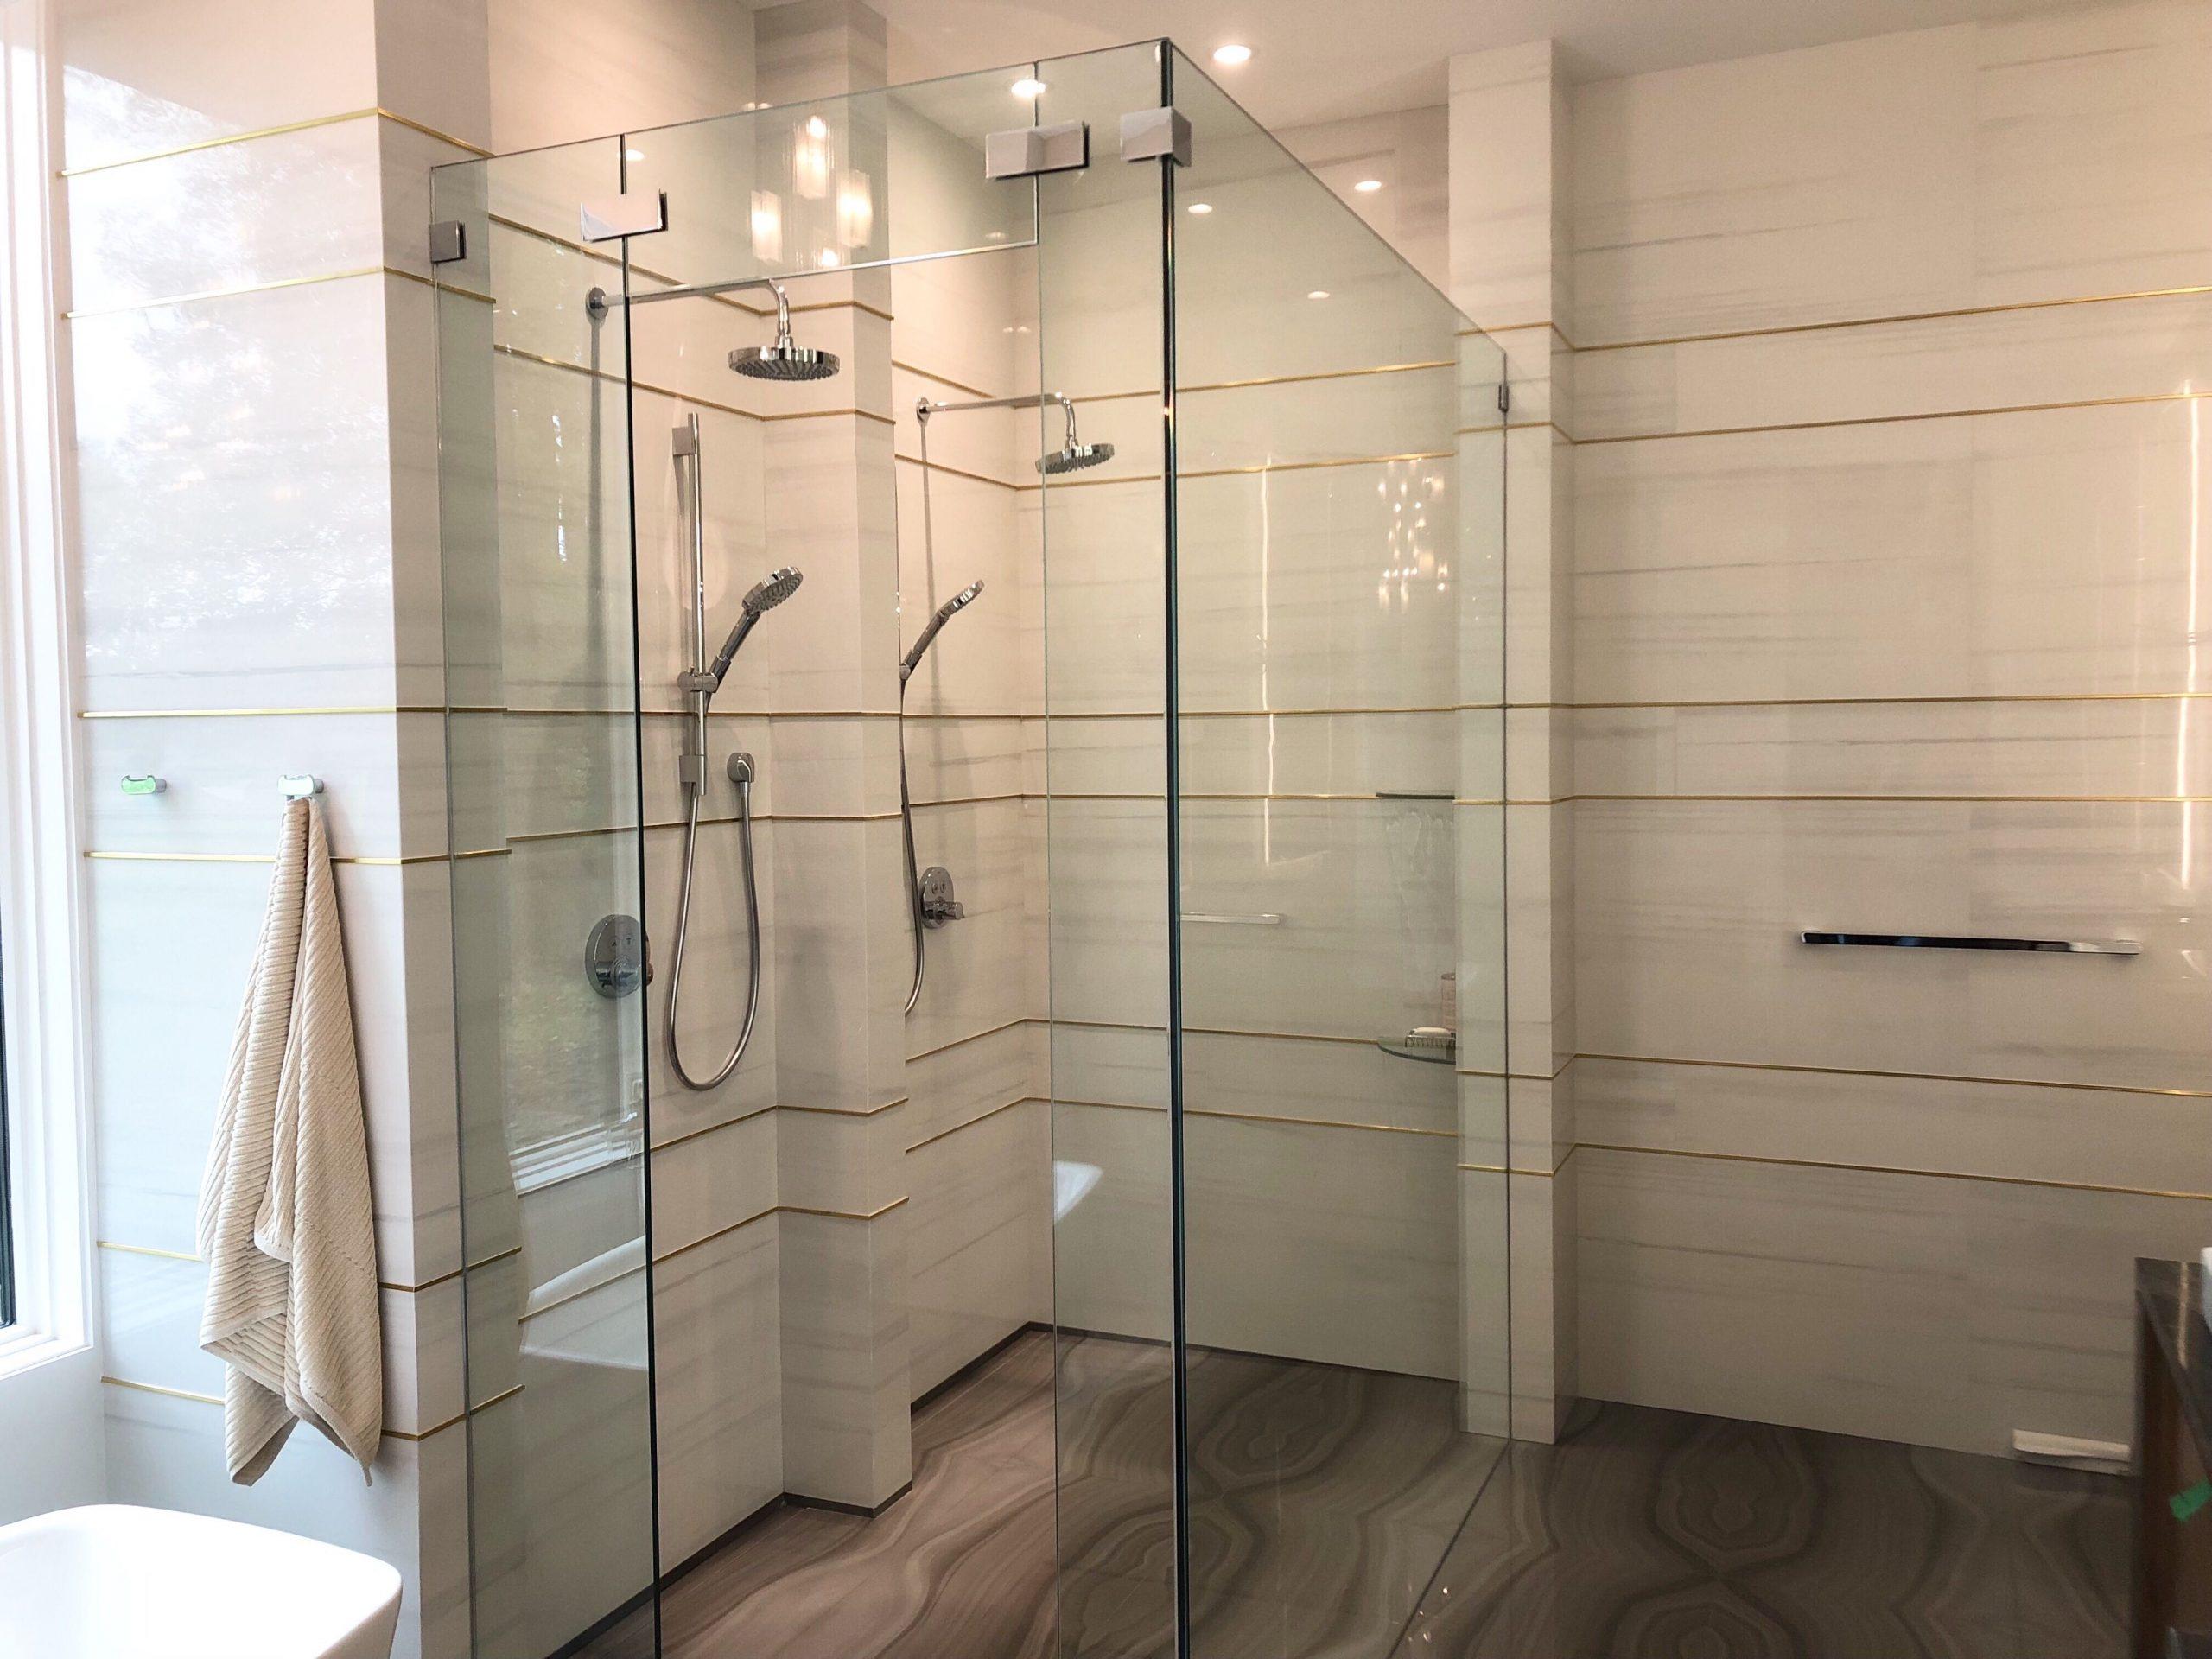 Shower - Bianco Lasa | Flooring - Absolute Deep